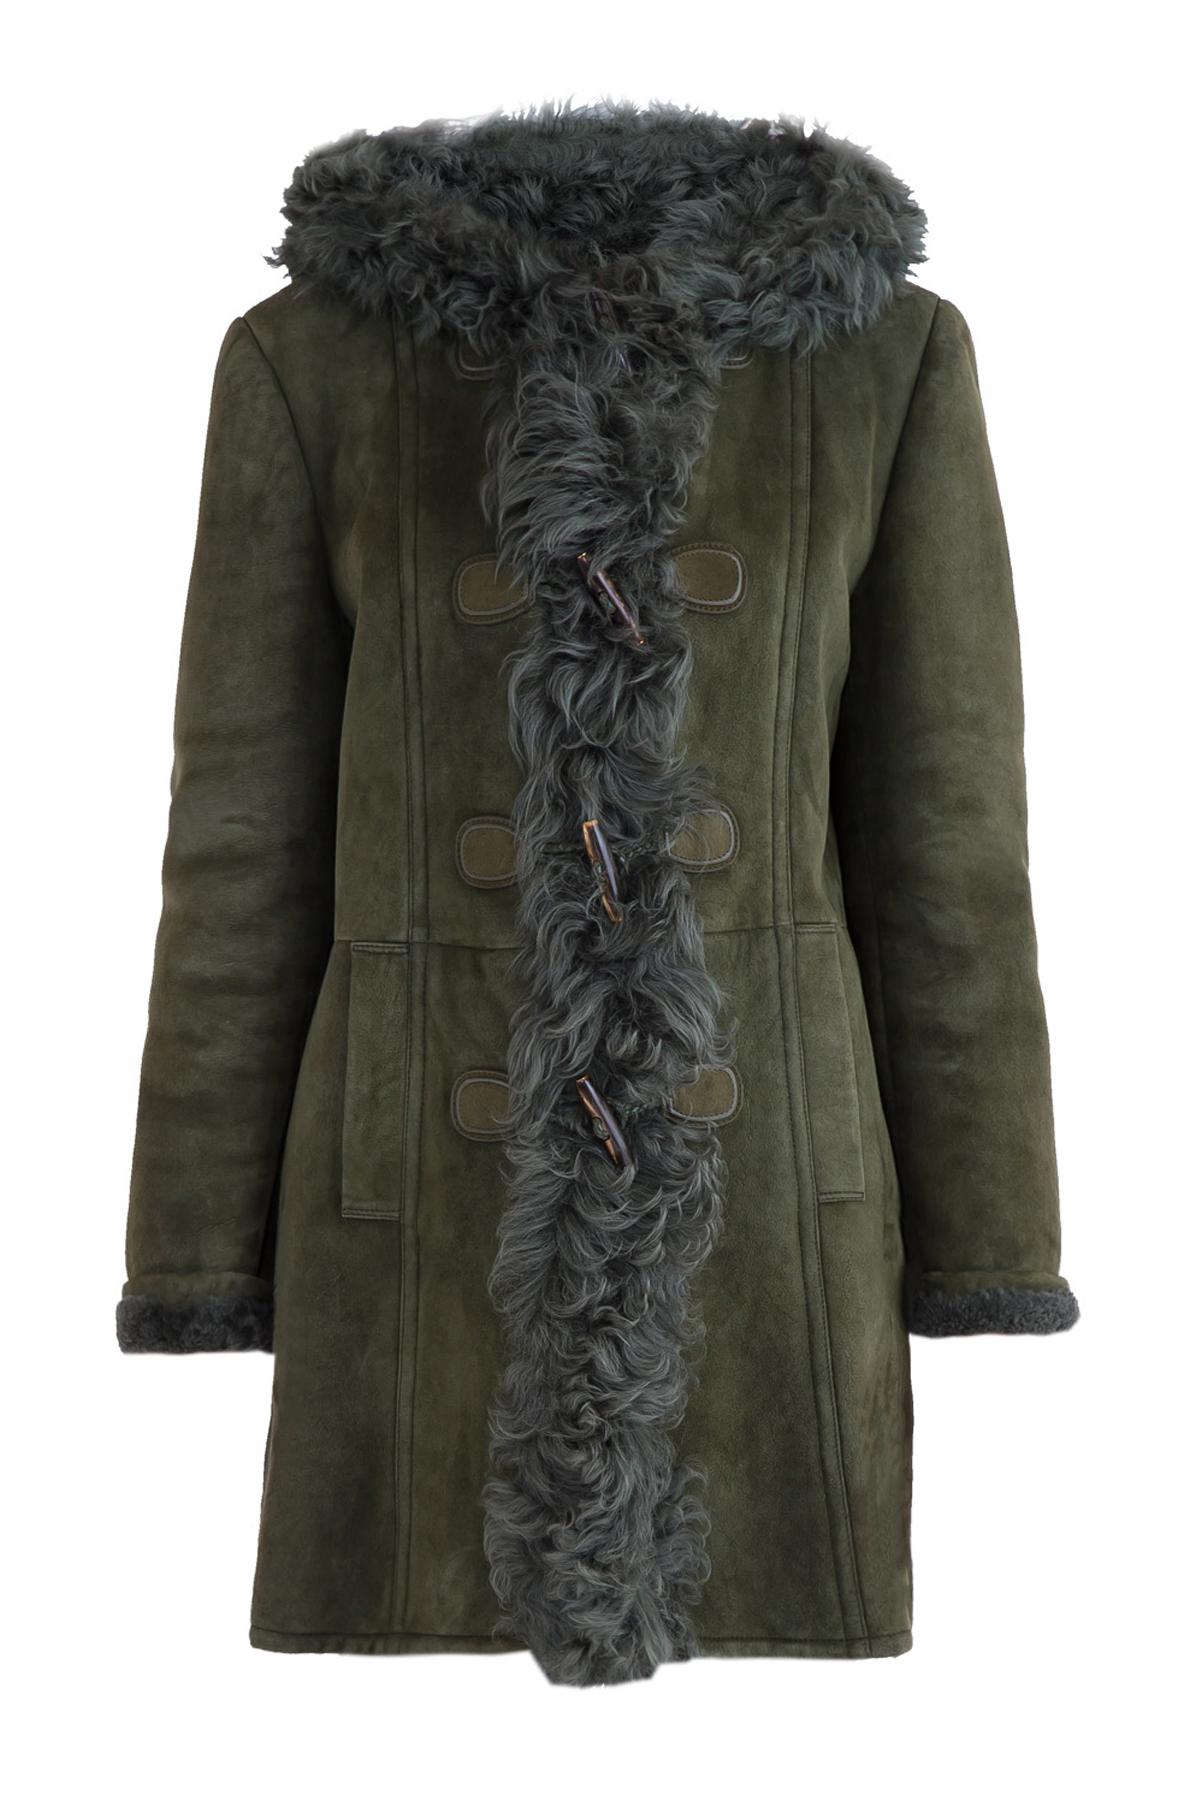 Купить Дубленка, GUCCI, Италия, овчина 100%, мех ягненка 100%